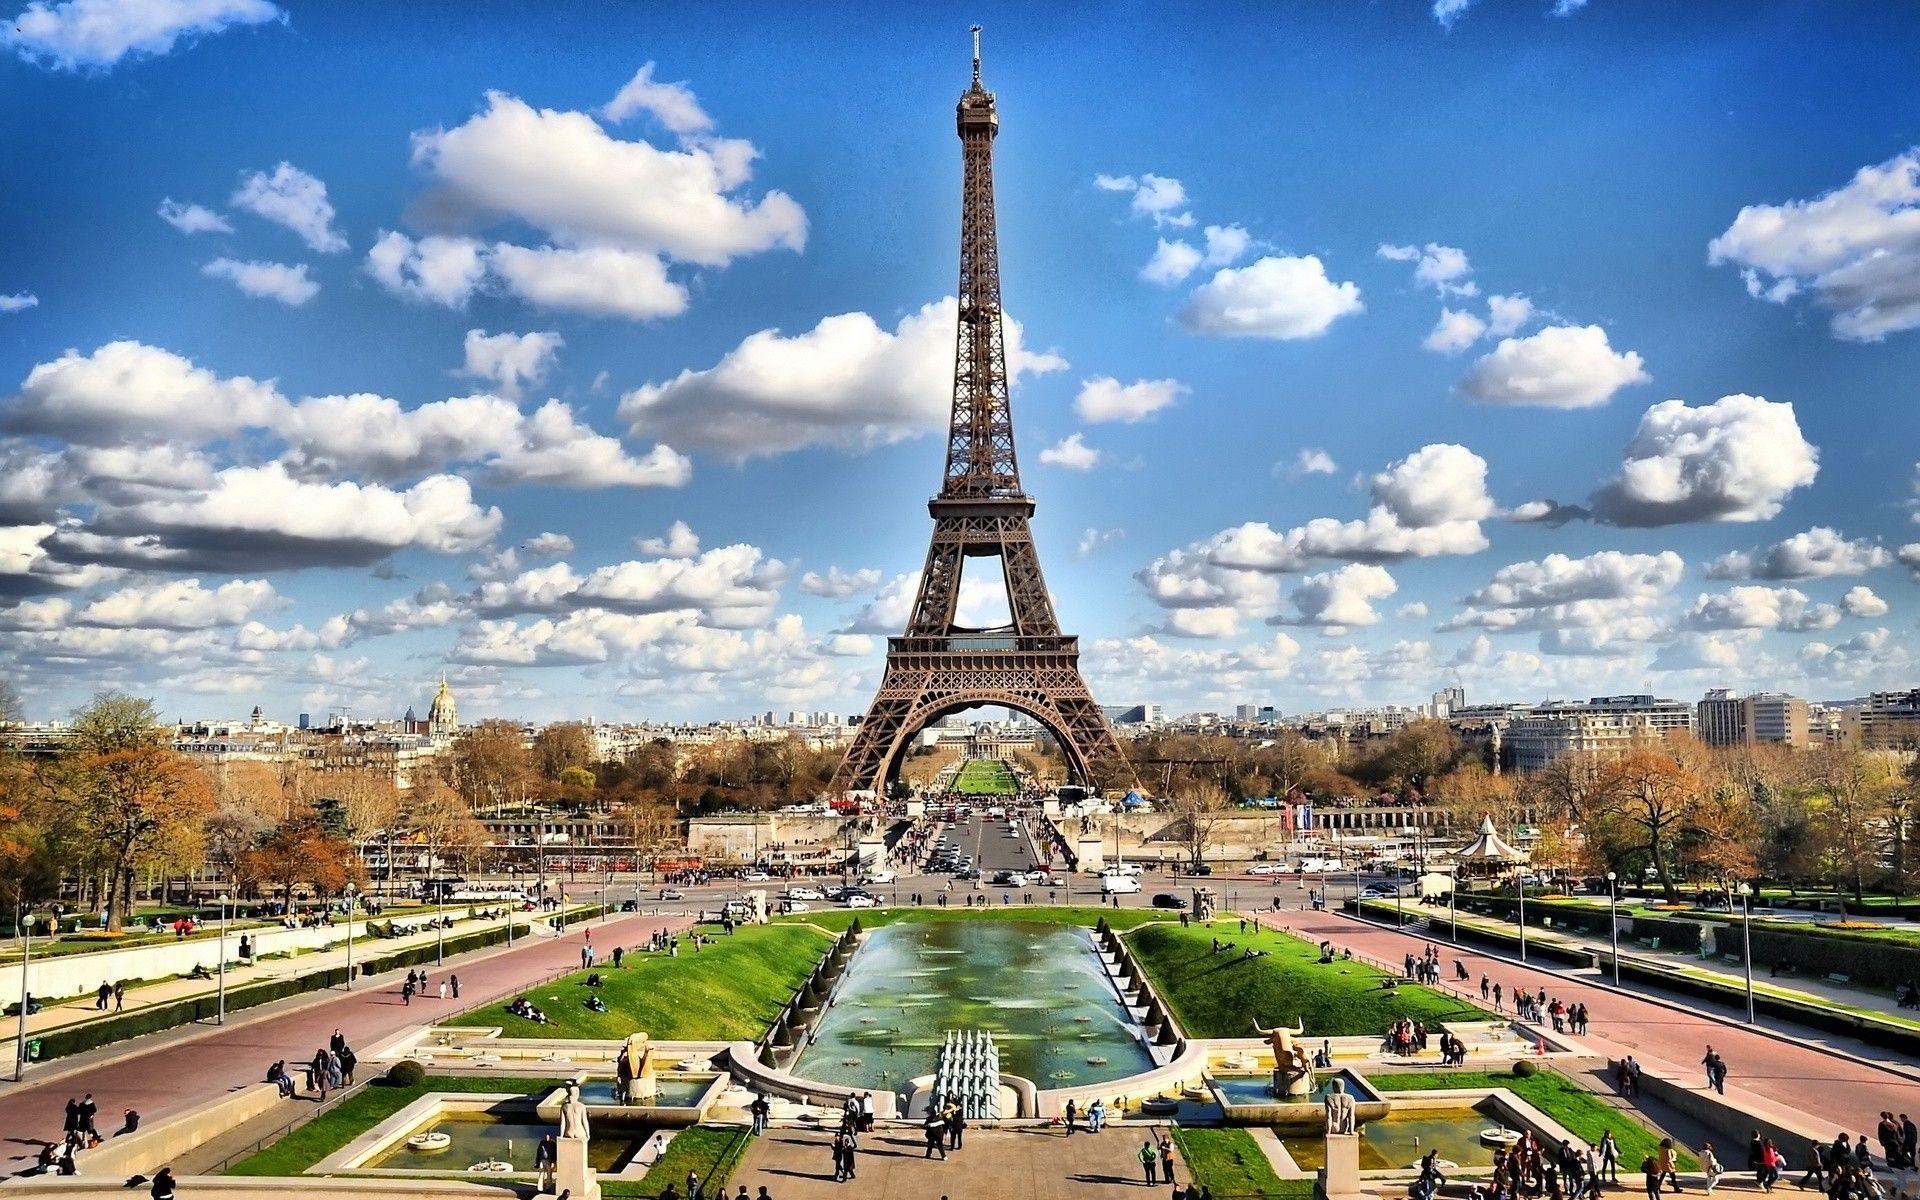 Eiffel Tower Paris Hd Wallpaper 1080p Paris Travel Eiffel Tower Paris Full hd eiffel tower wallpaper hd 1080p